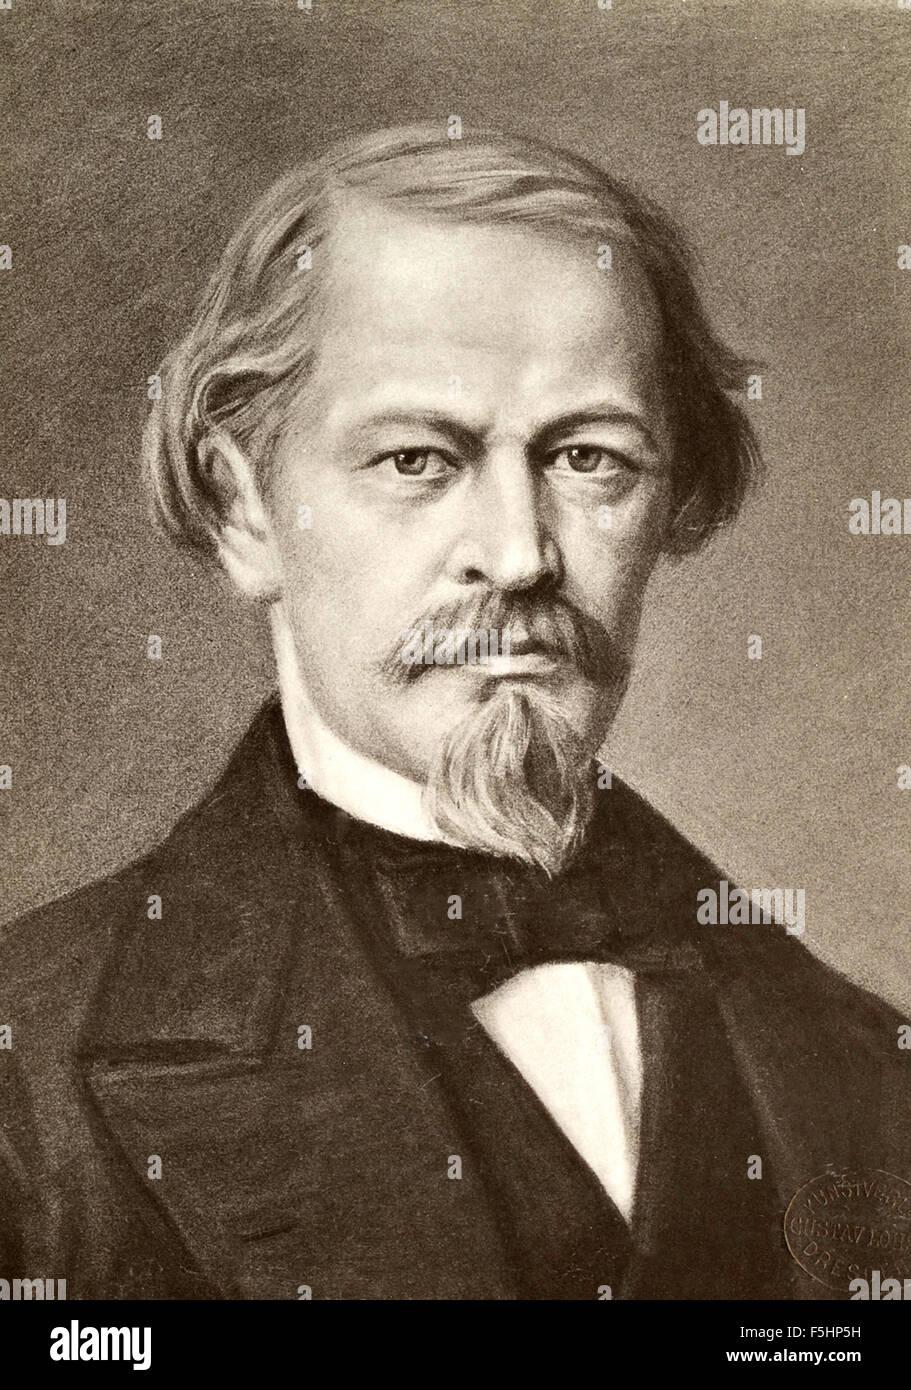 Portrait of German playwright Gustav Freytag - Stock Image